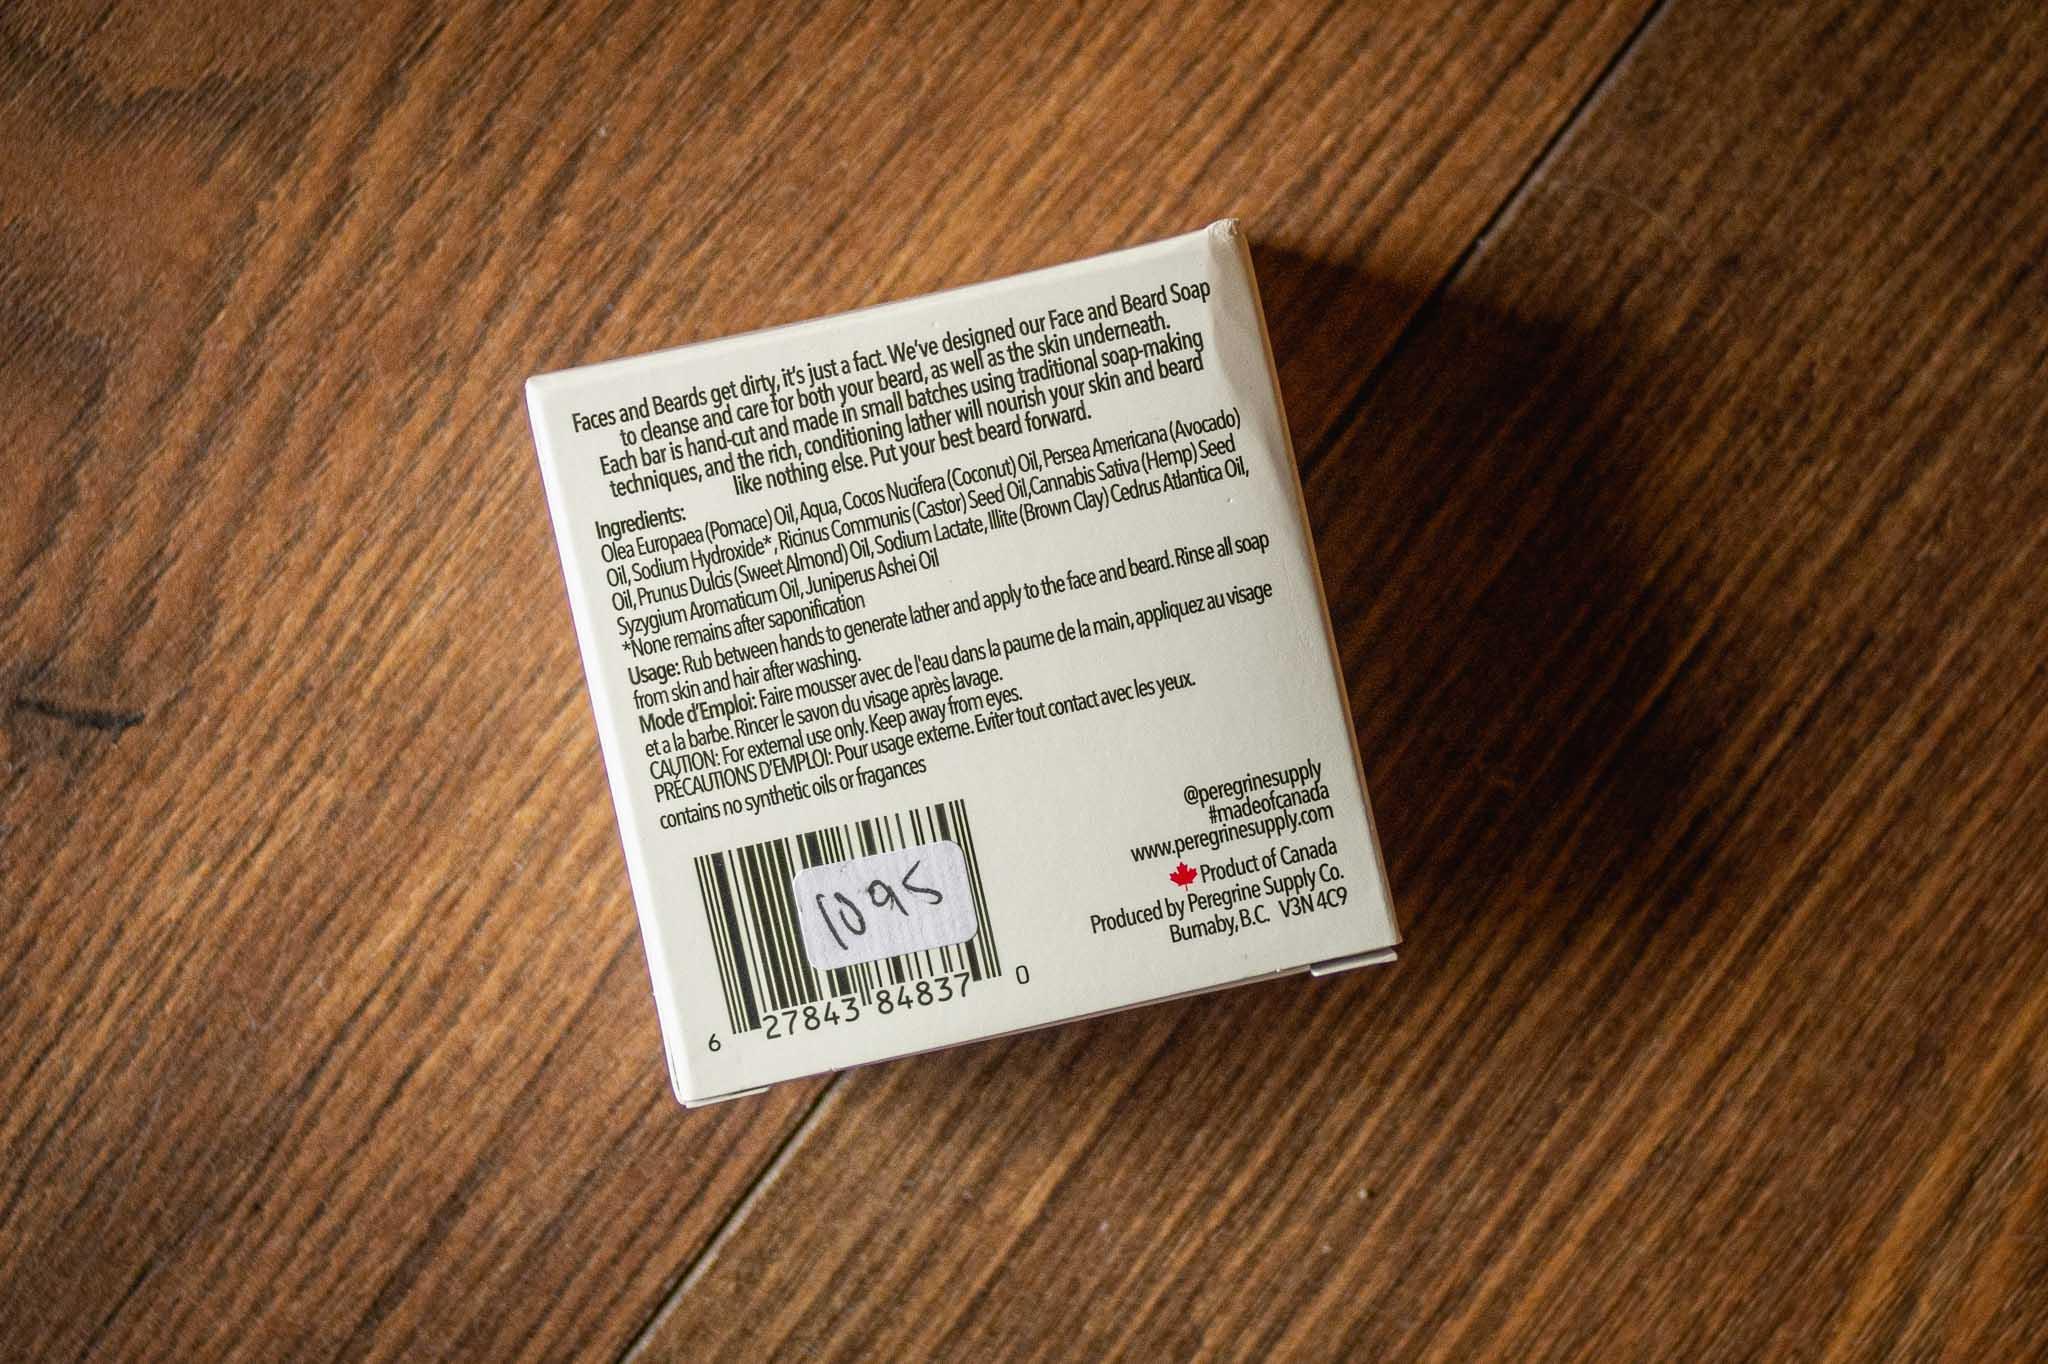 Face & Beard Soap by Peregrine Supply Co